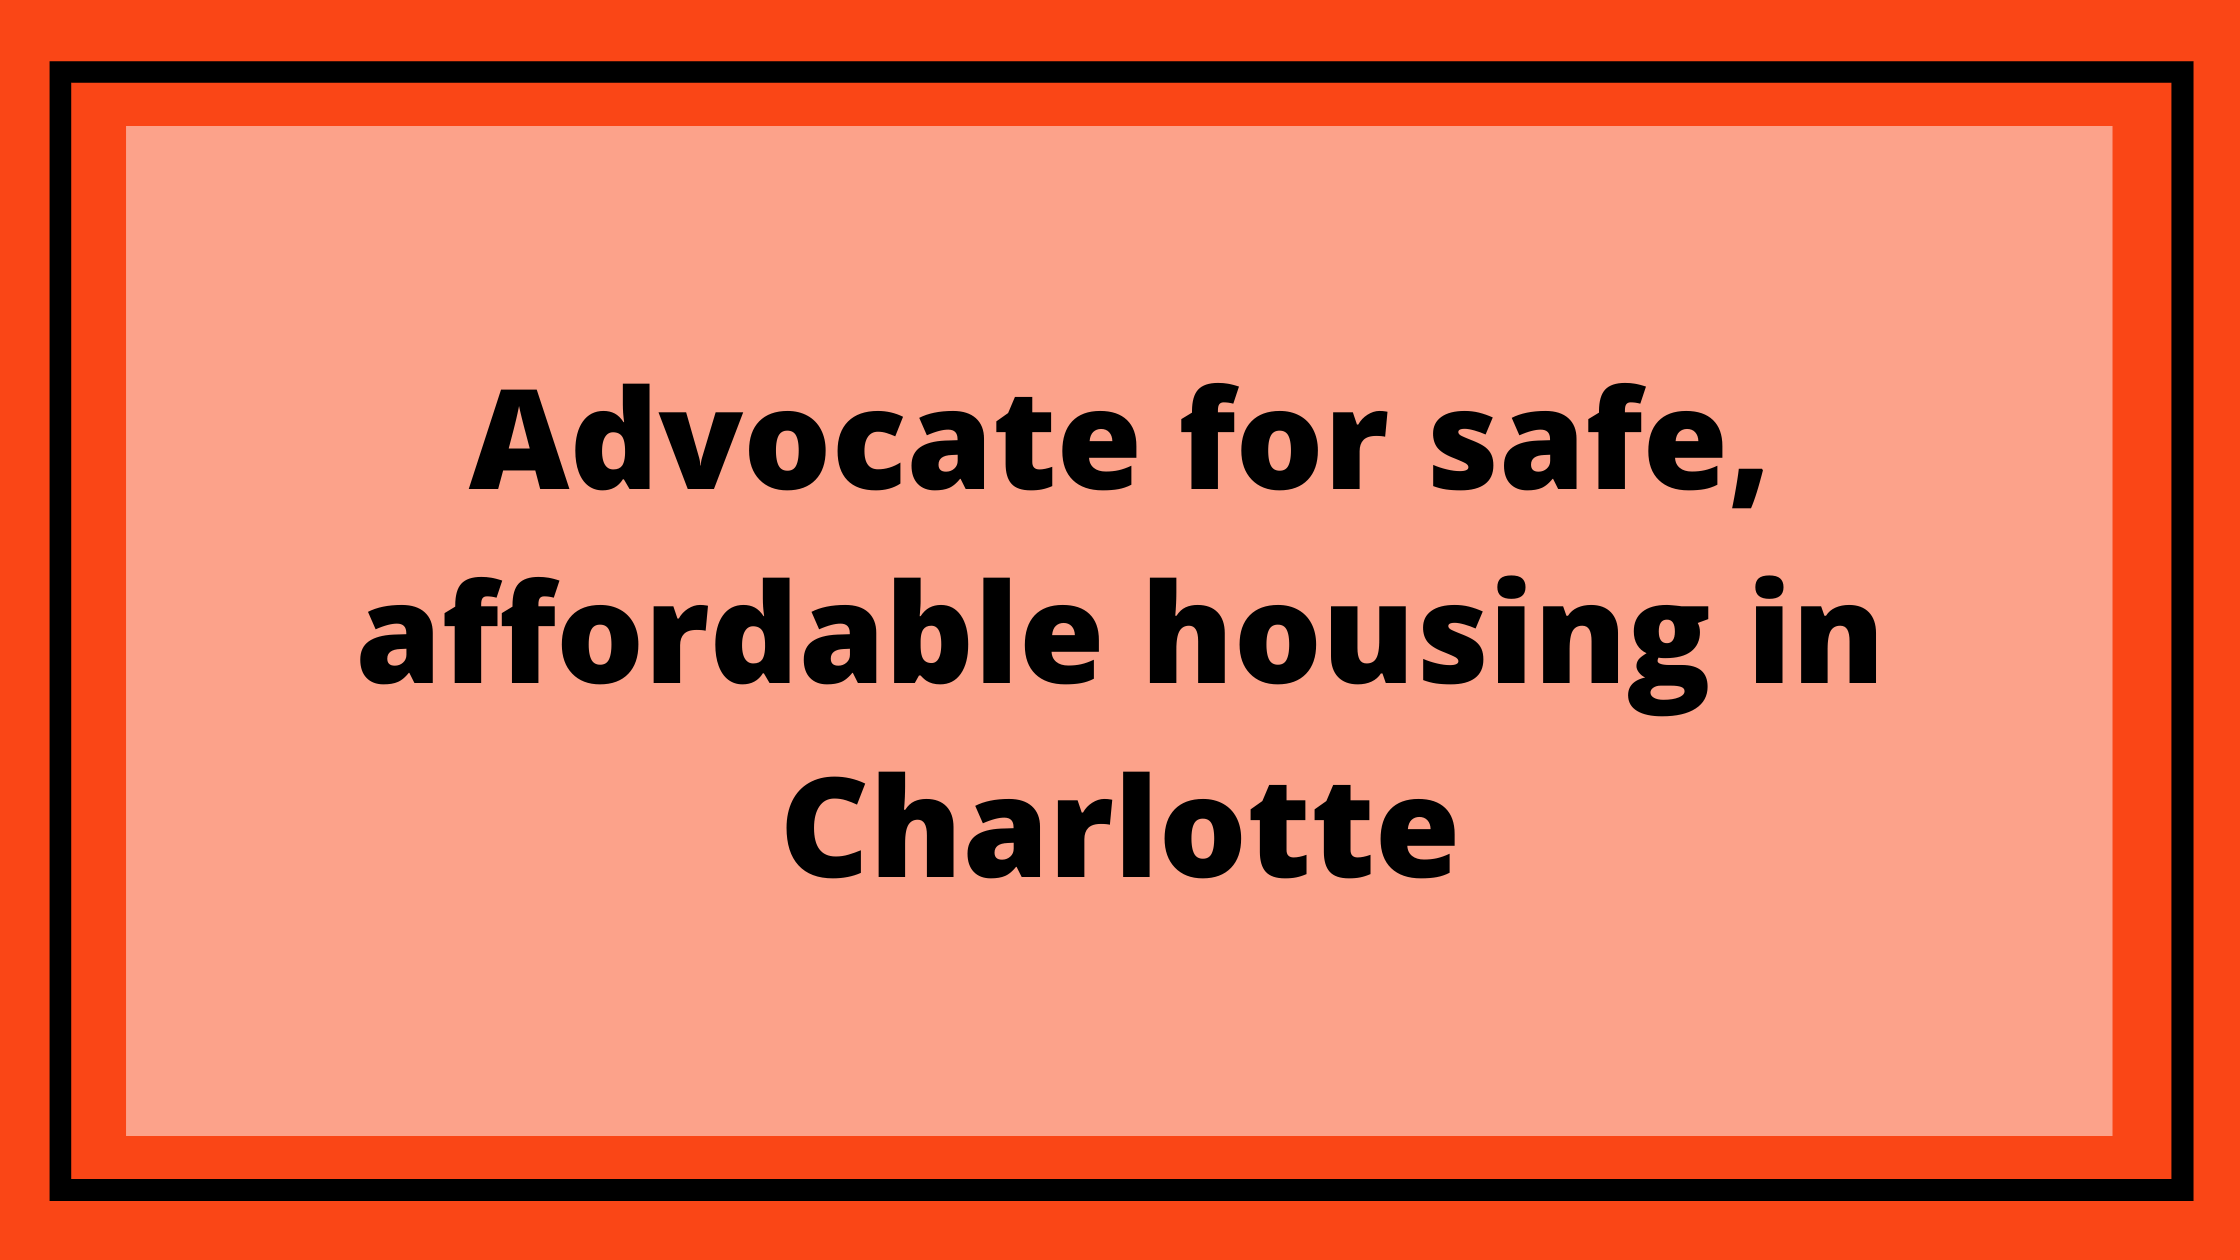 End Source of Income Discrimination in Charlotte